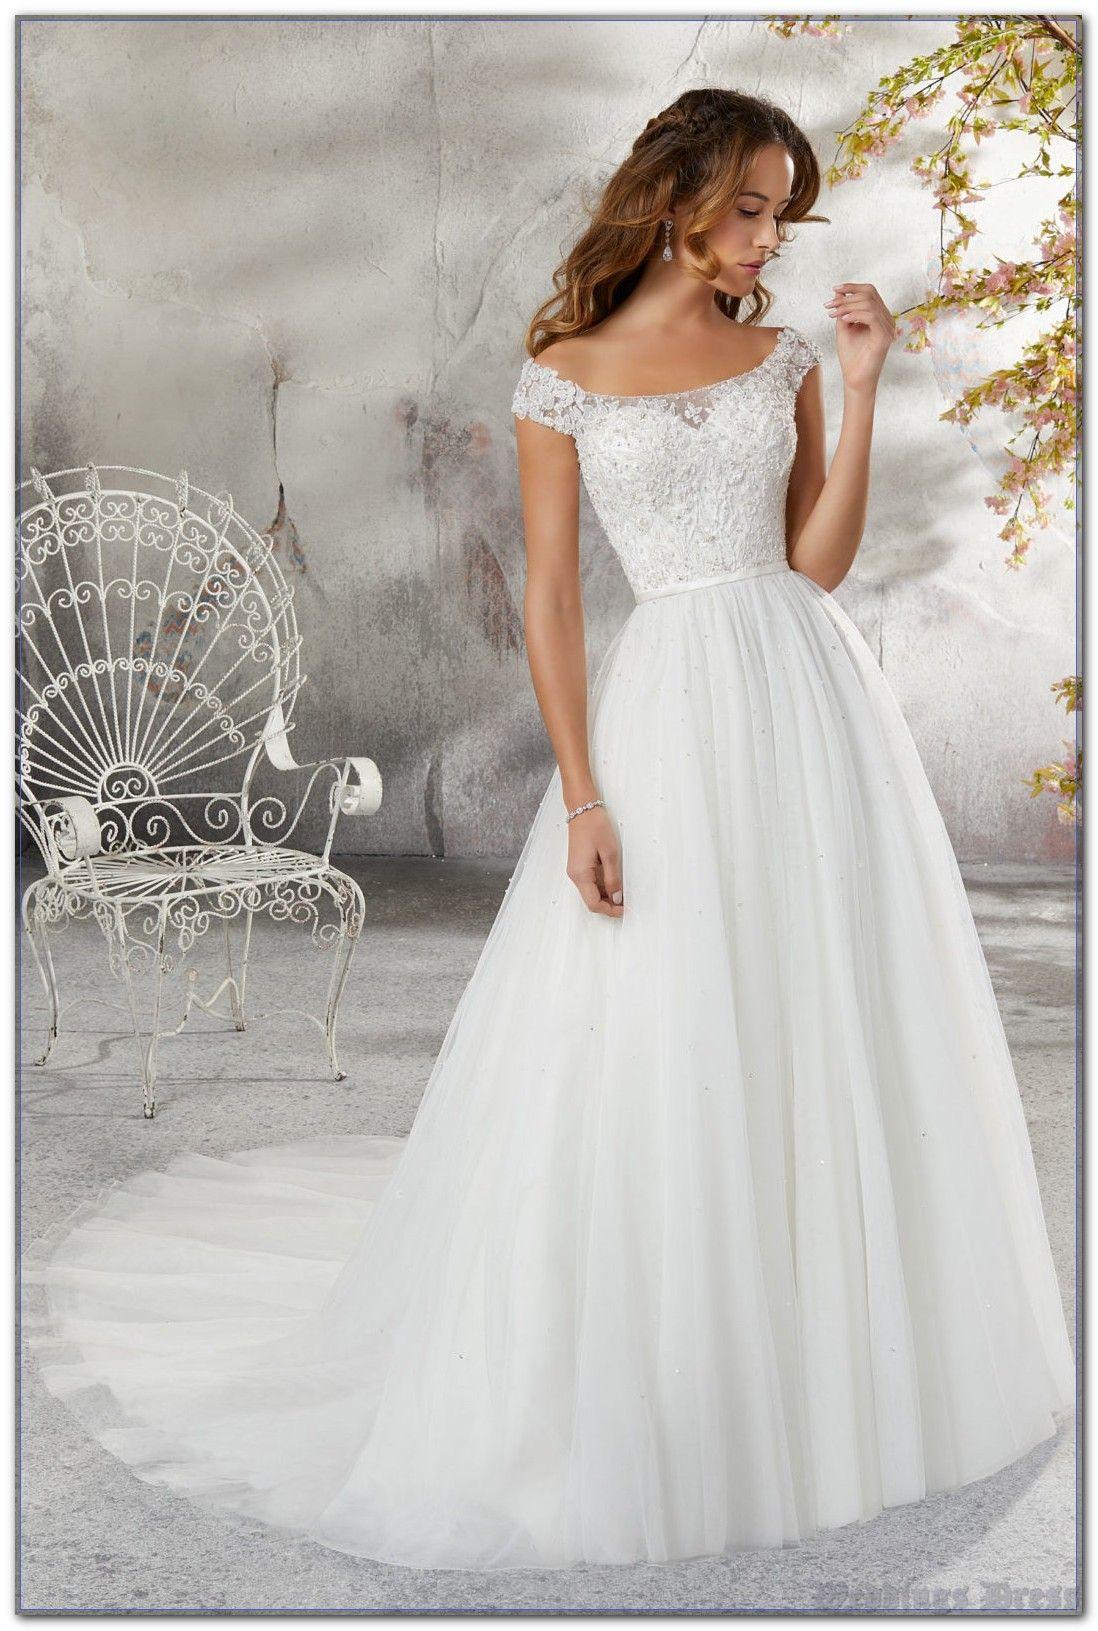 Guaranteed No Stress Weddings Dress